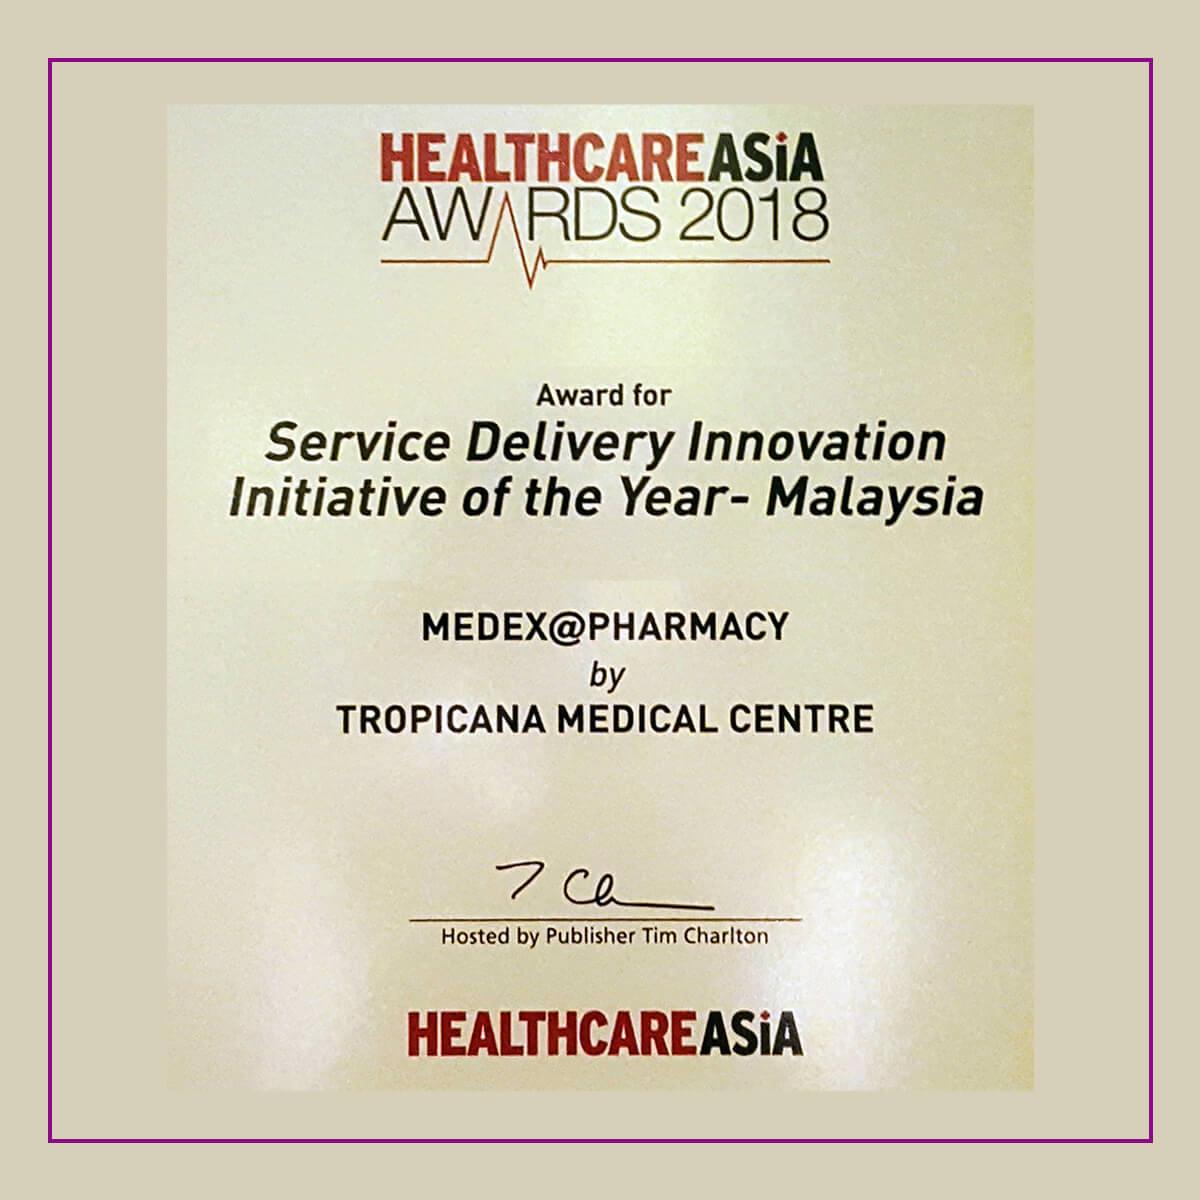 THKD Awards Healthcare Asia Award 2018